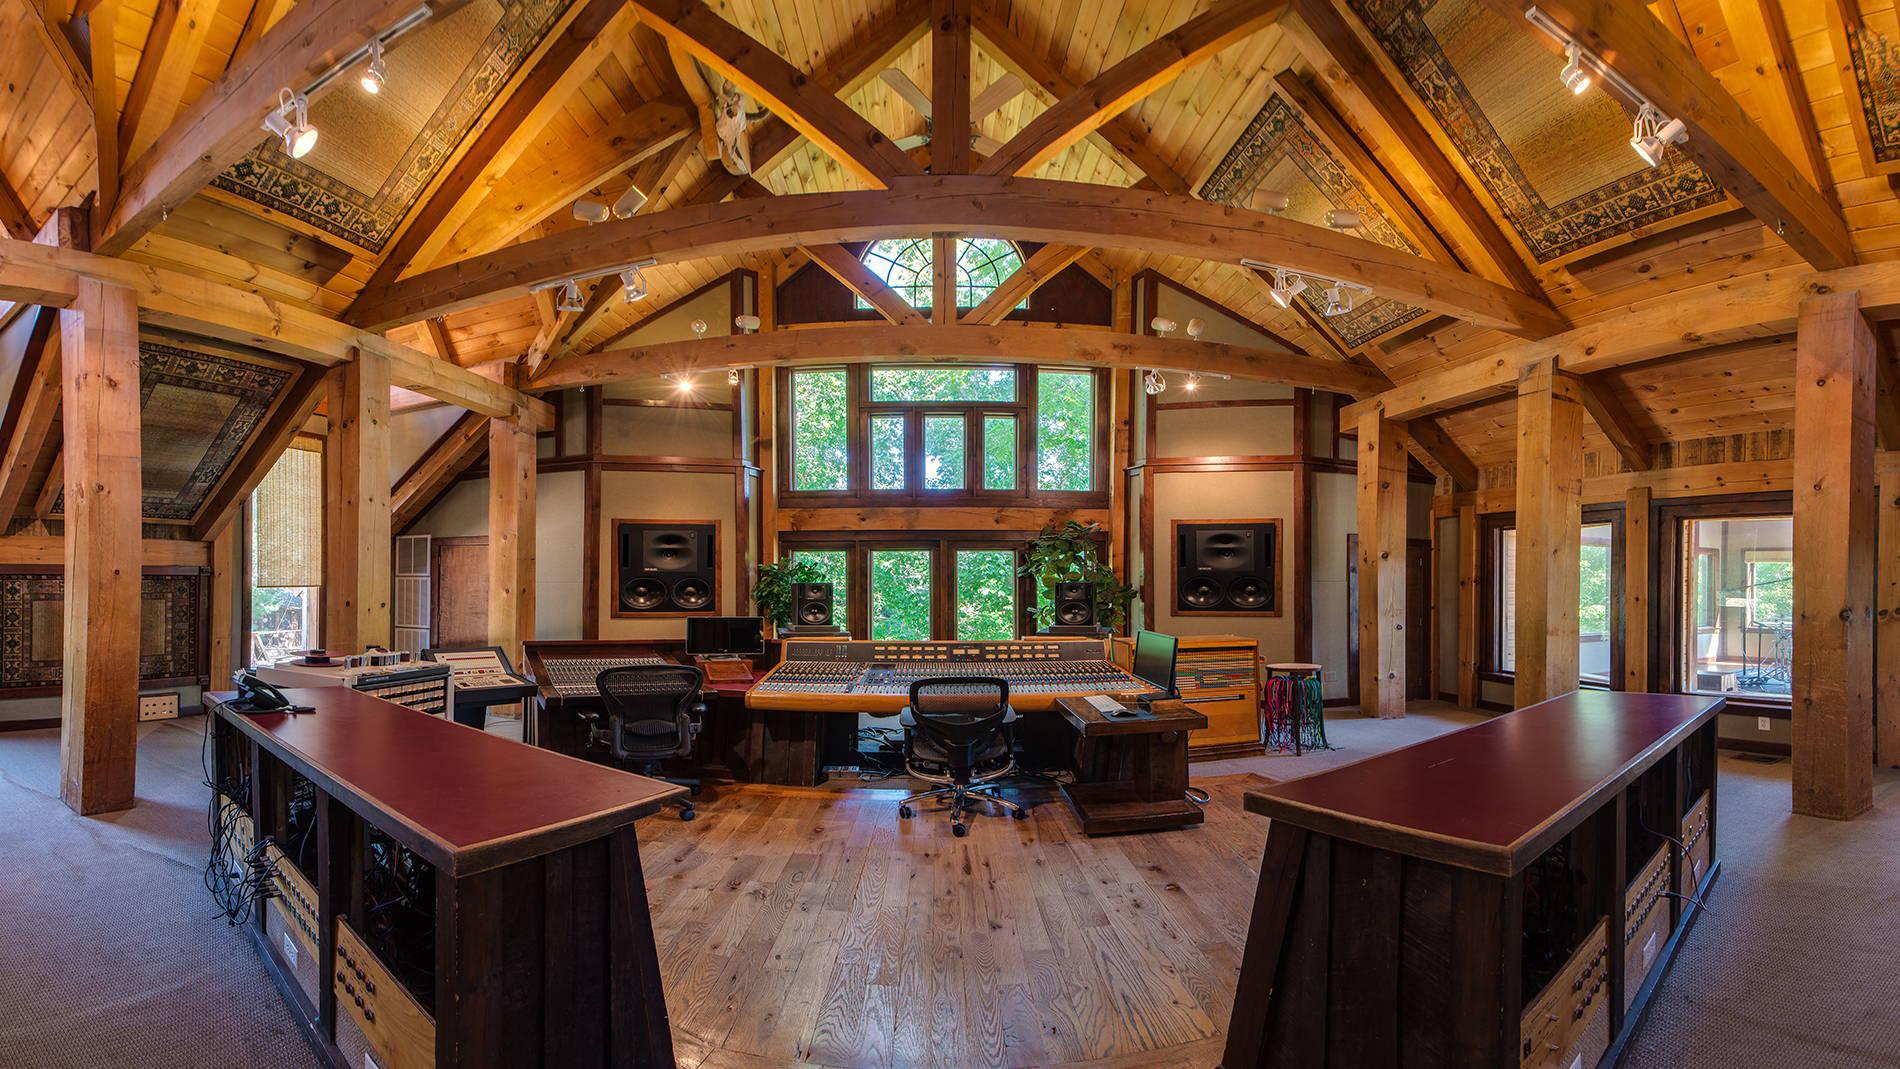 The Lodge Control Room